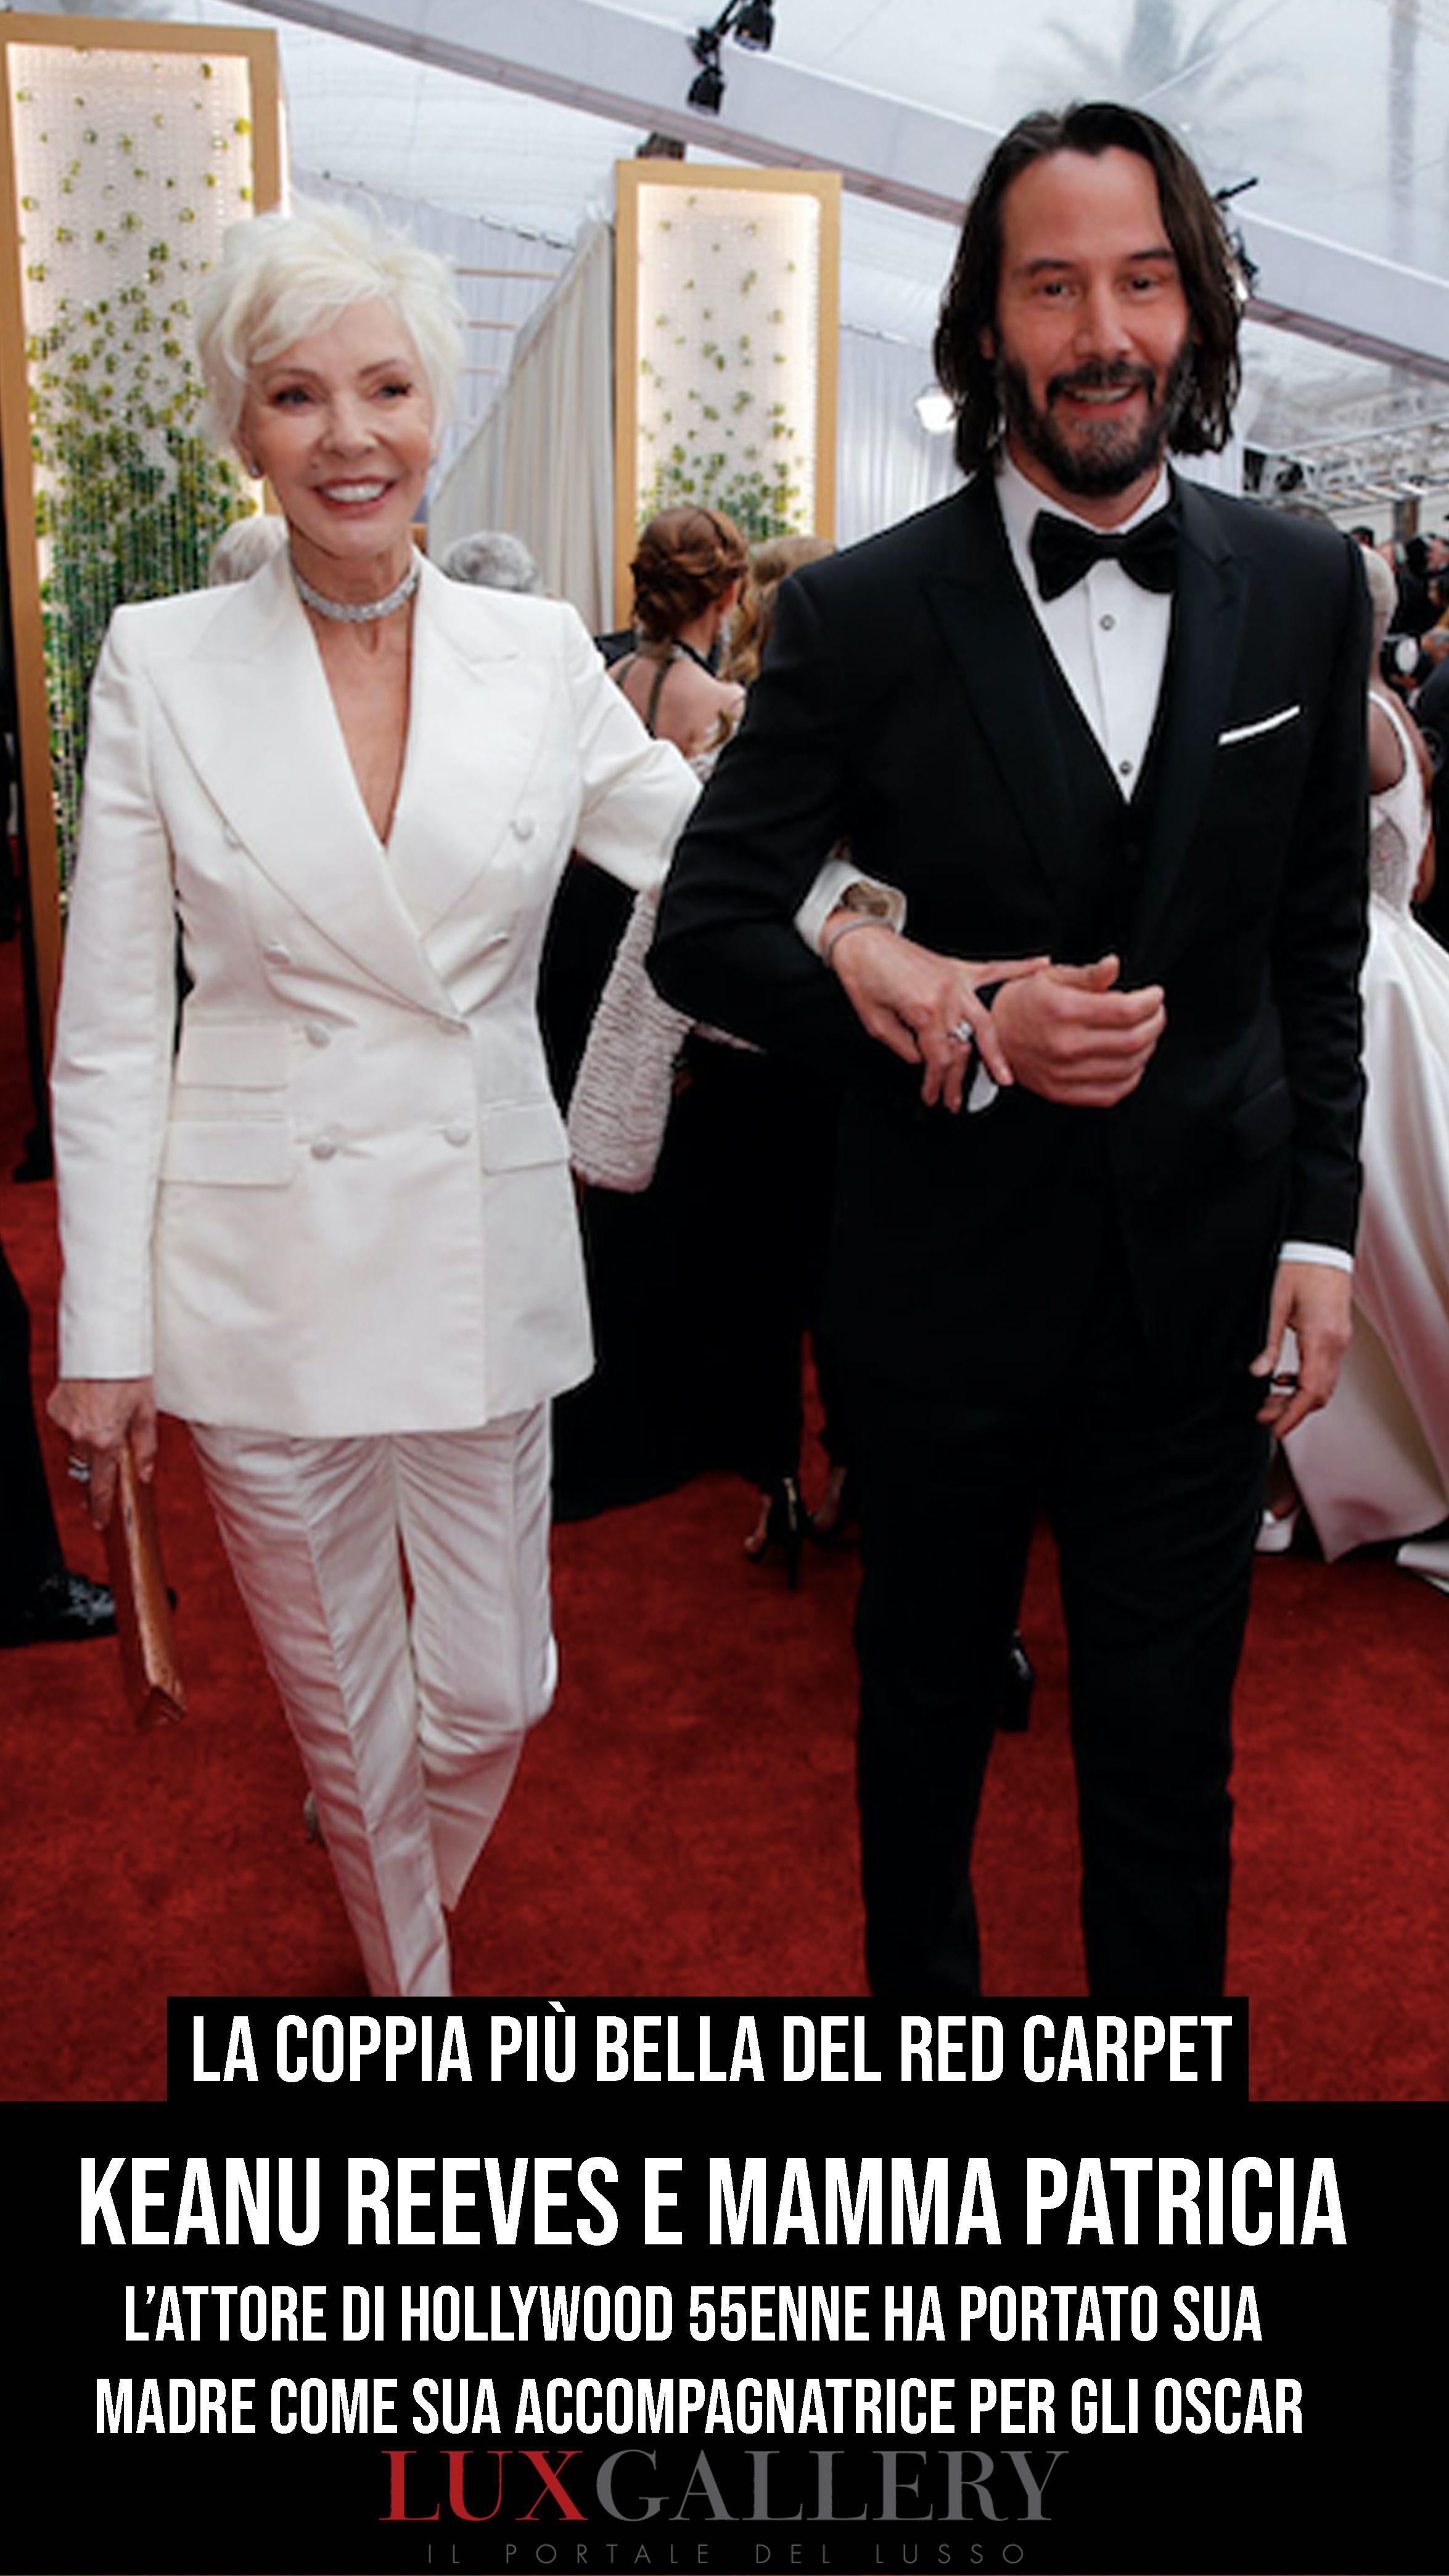 Oscar 2020 Keanu Reeves E Mamma Patricia La Coppia Piu Bella Del Tappeto Rosso Keanu Reeves Hollywood Coppie